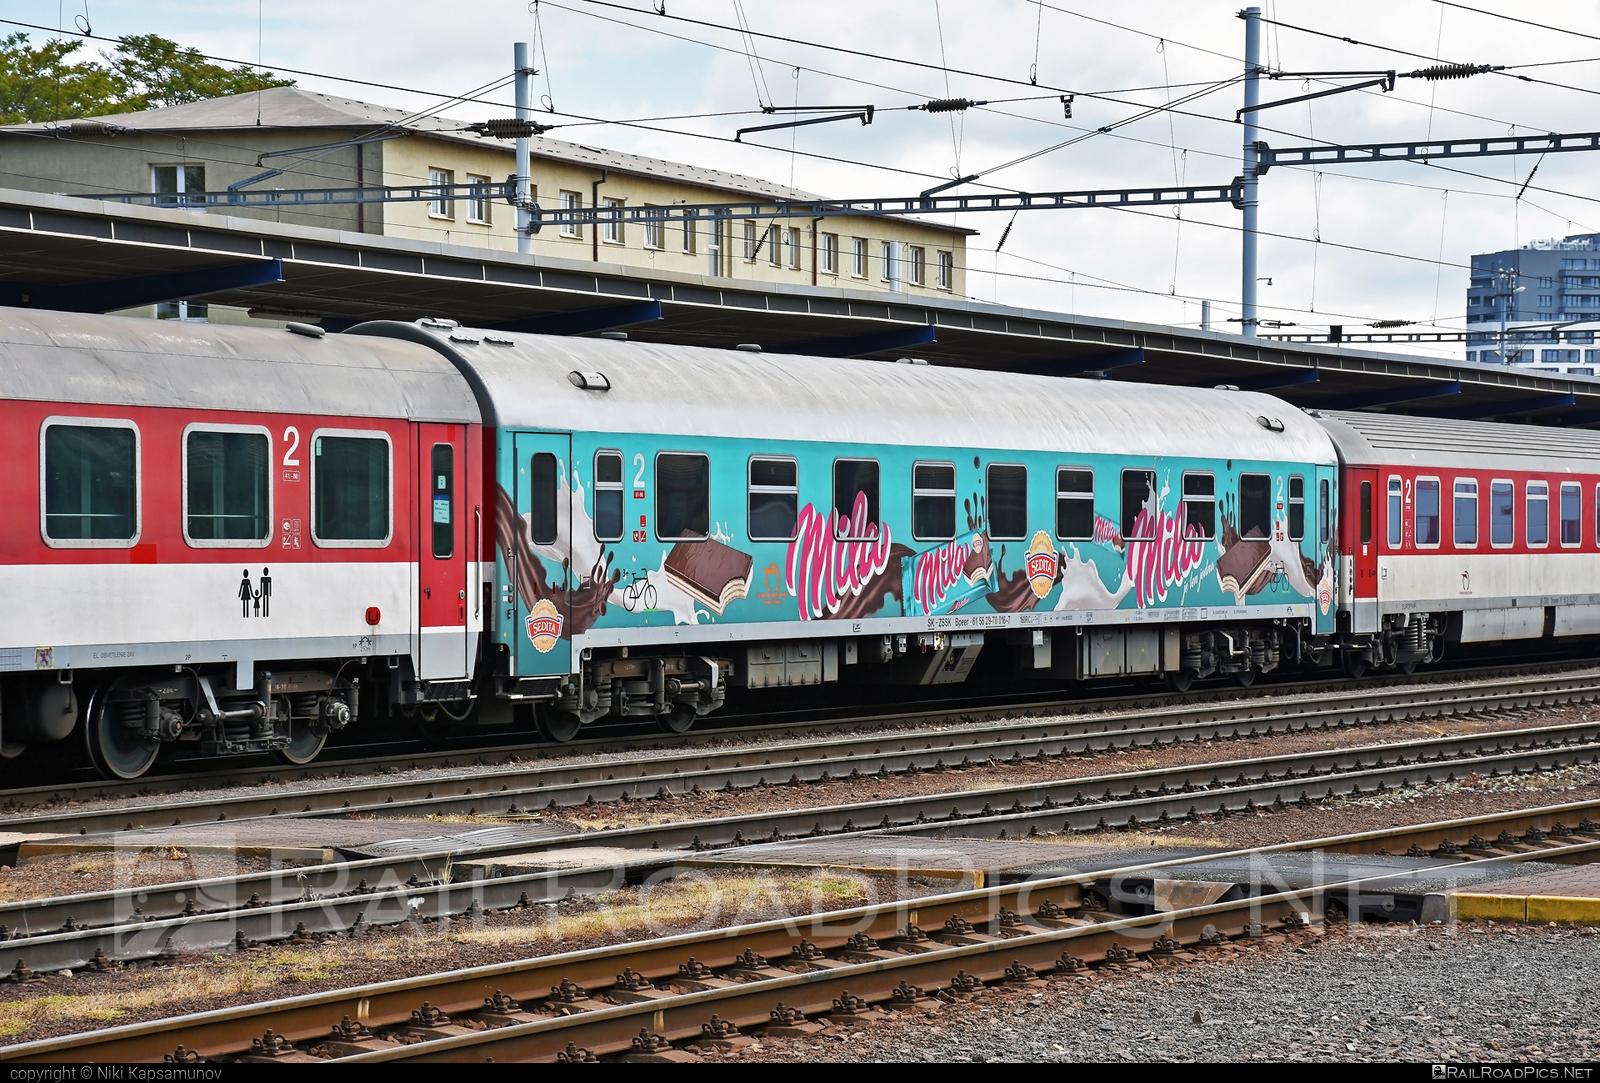 Class B - Bpeer - 29-70 016-7 operated by Železničná Spoločnost' Slovensko, a.s. #ZeleznicnaSpolocnostSlovensko #bpeer #mila #zssk